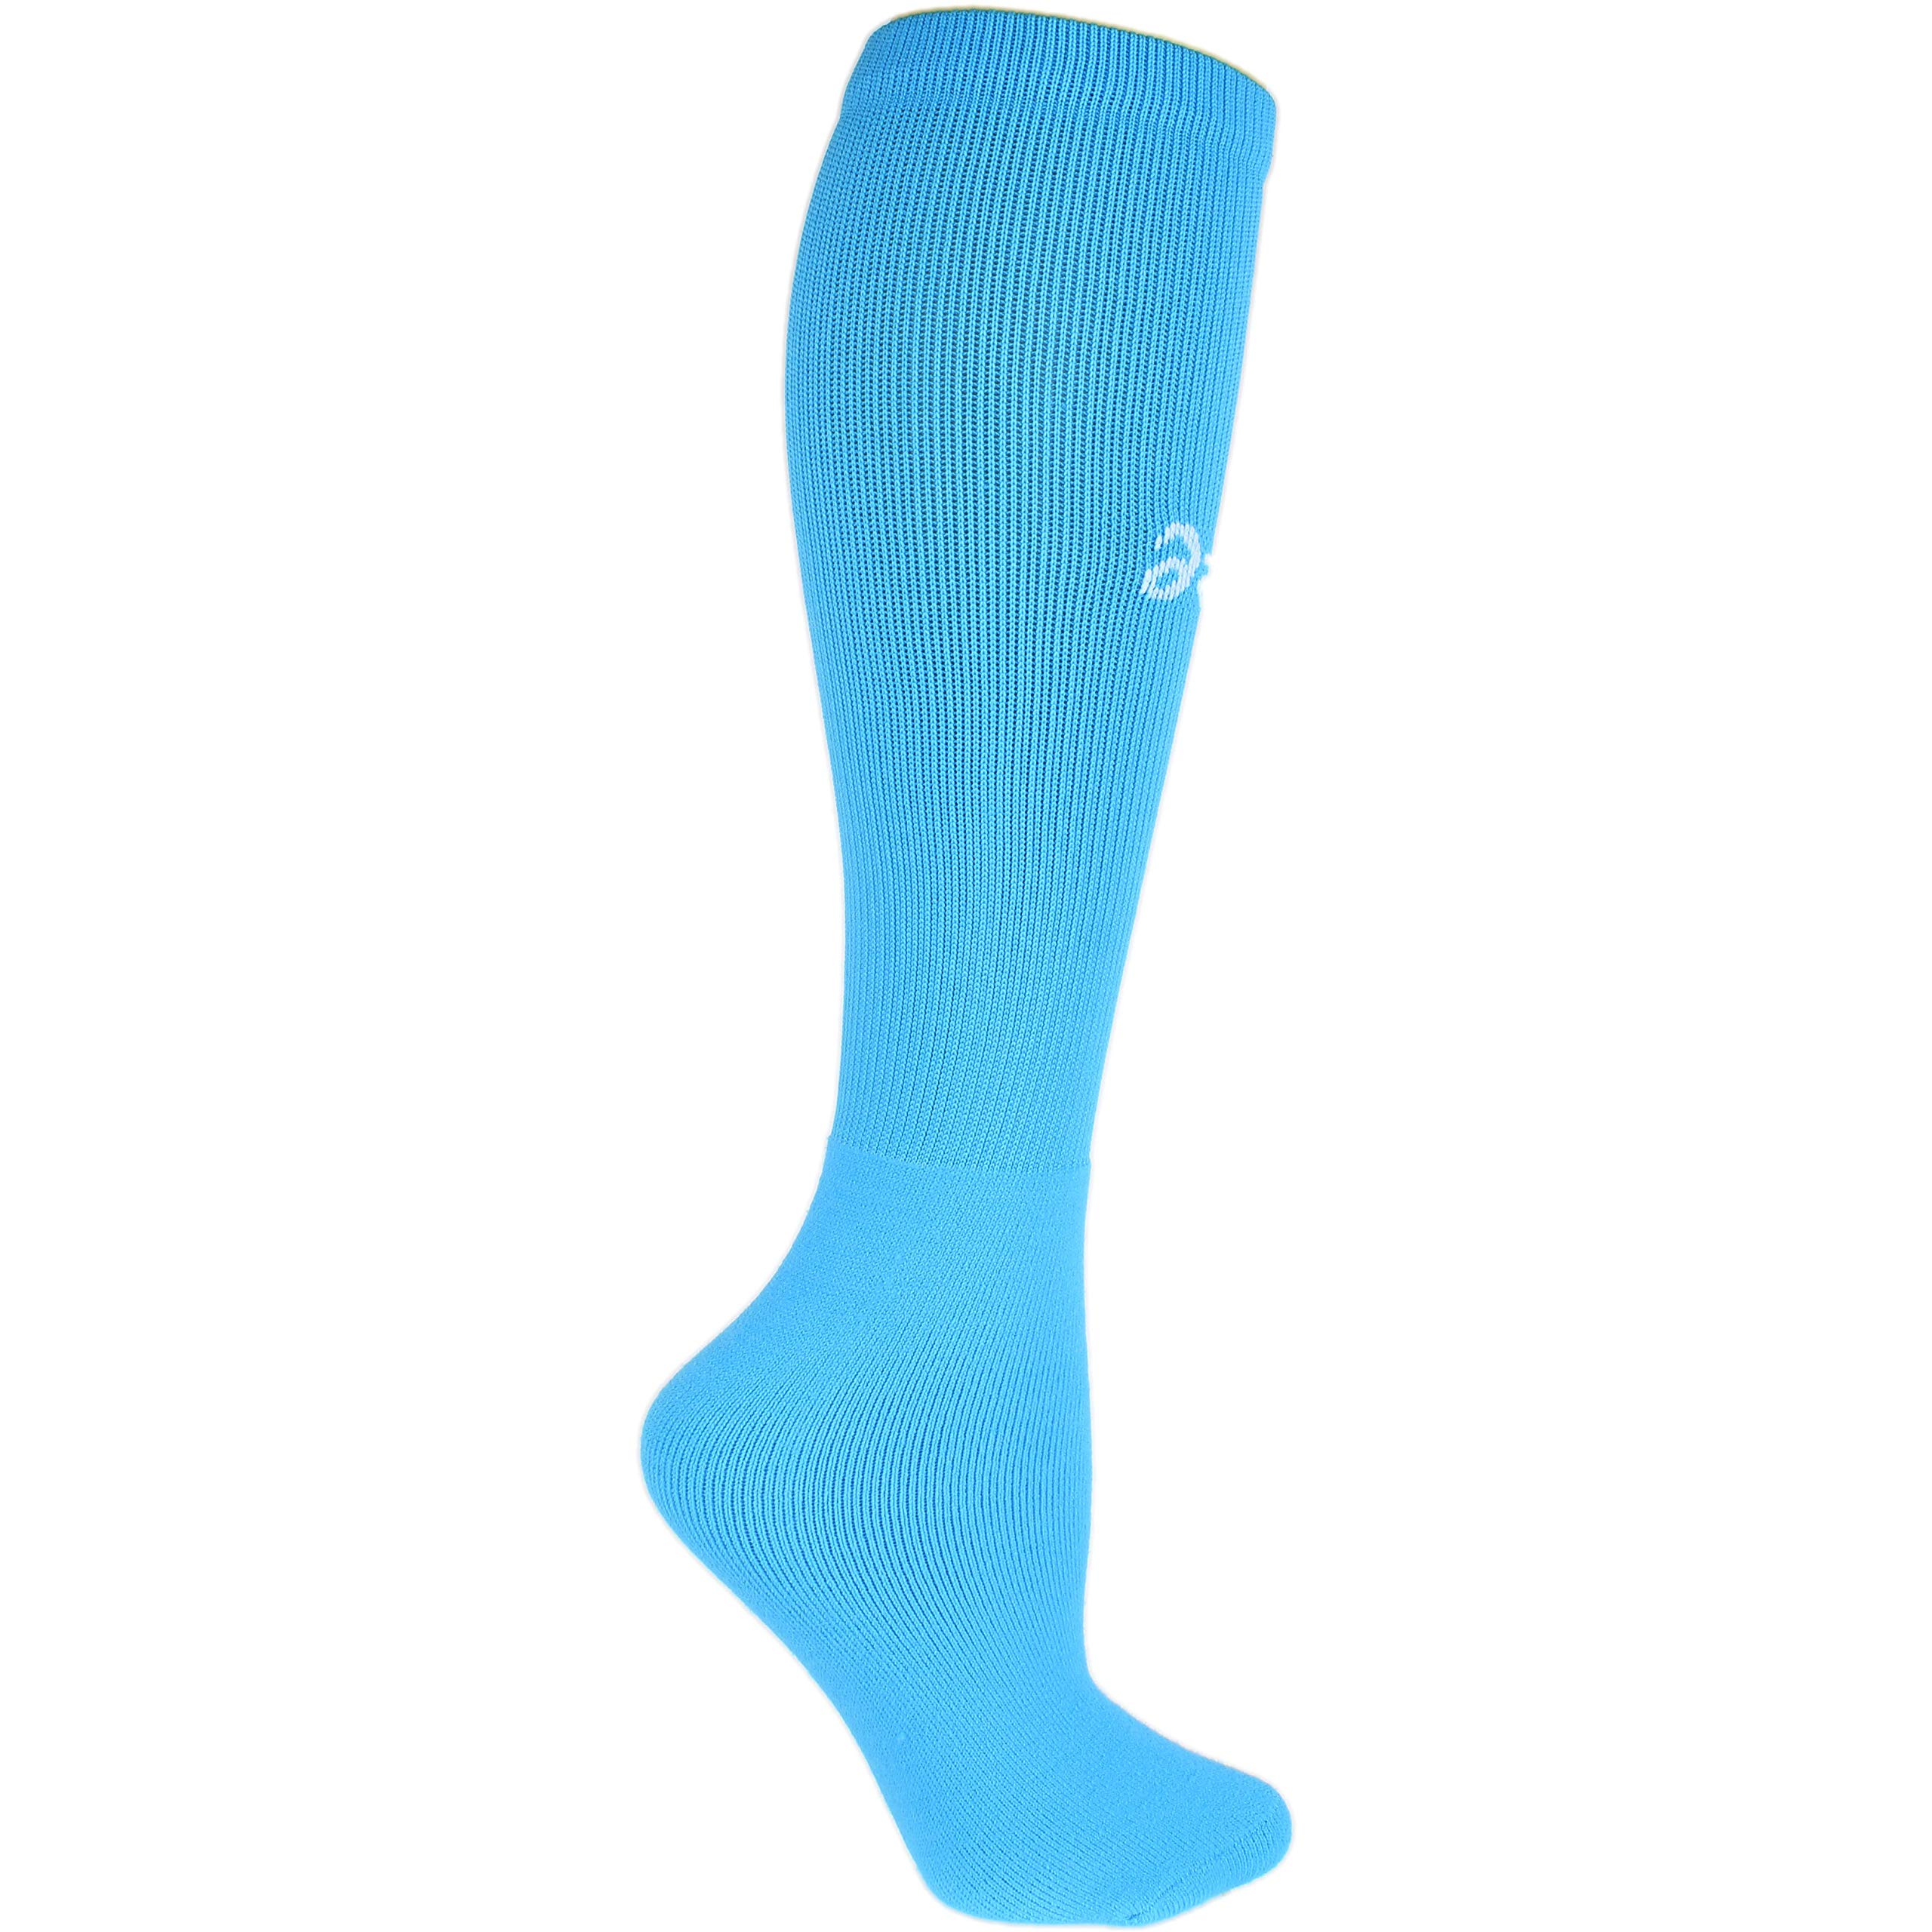 ASICS All Sport Court Sock, Cyan Blue, X-Large by ASICS